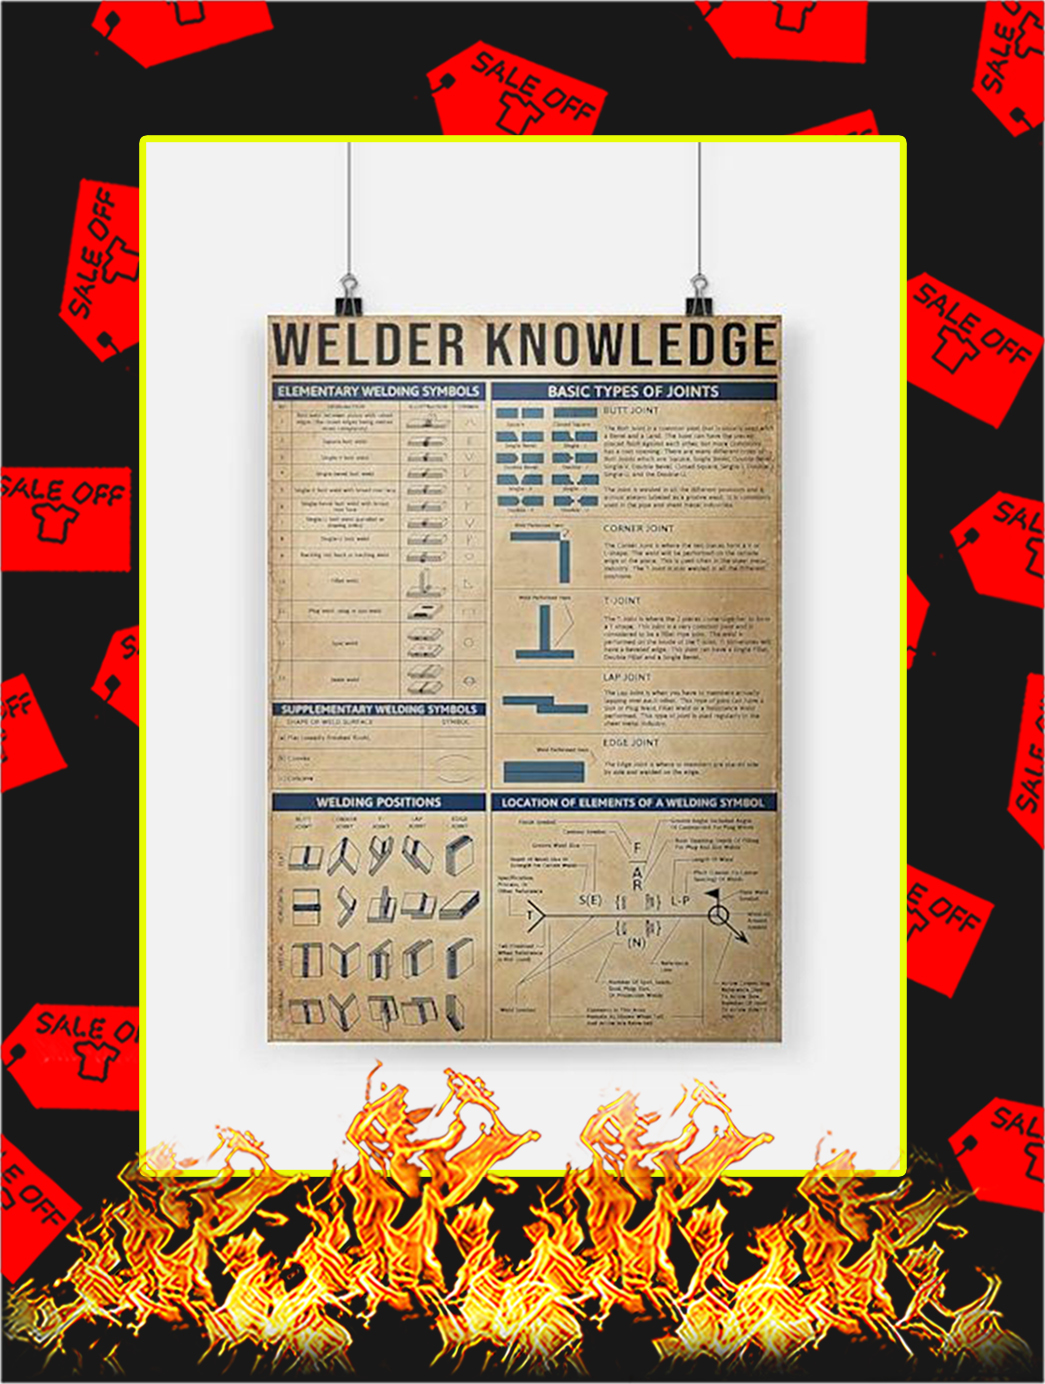 Welder Knowledge Poster - A2